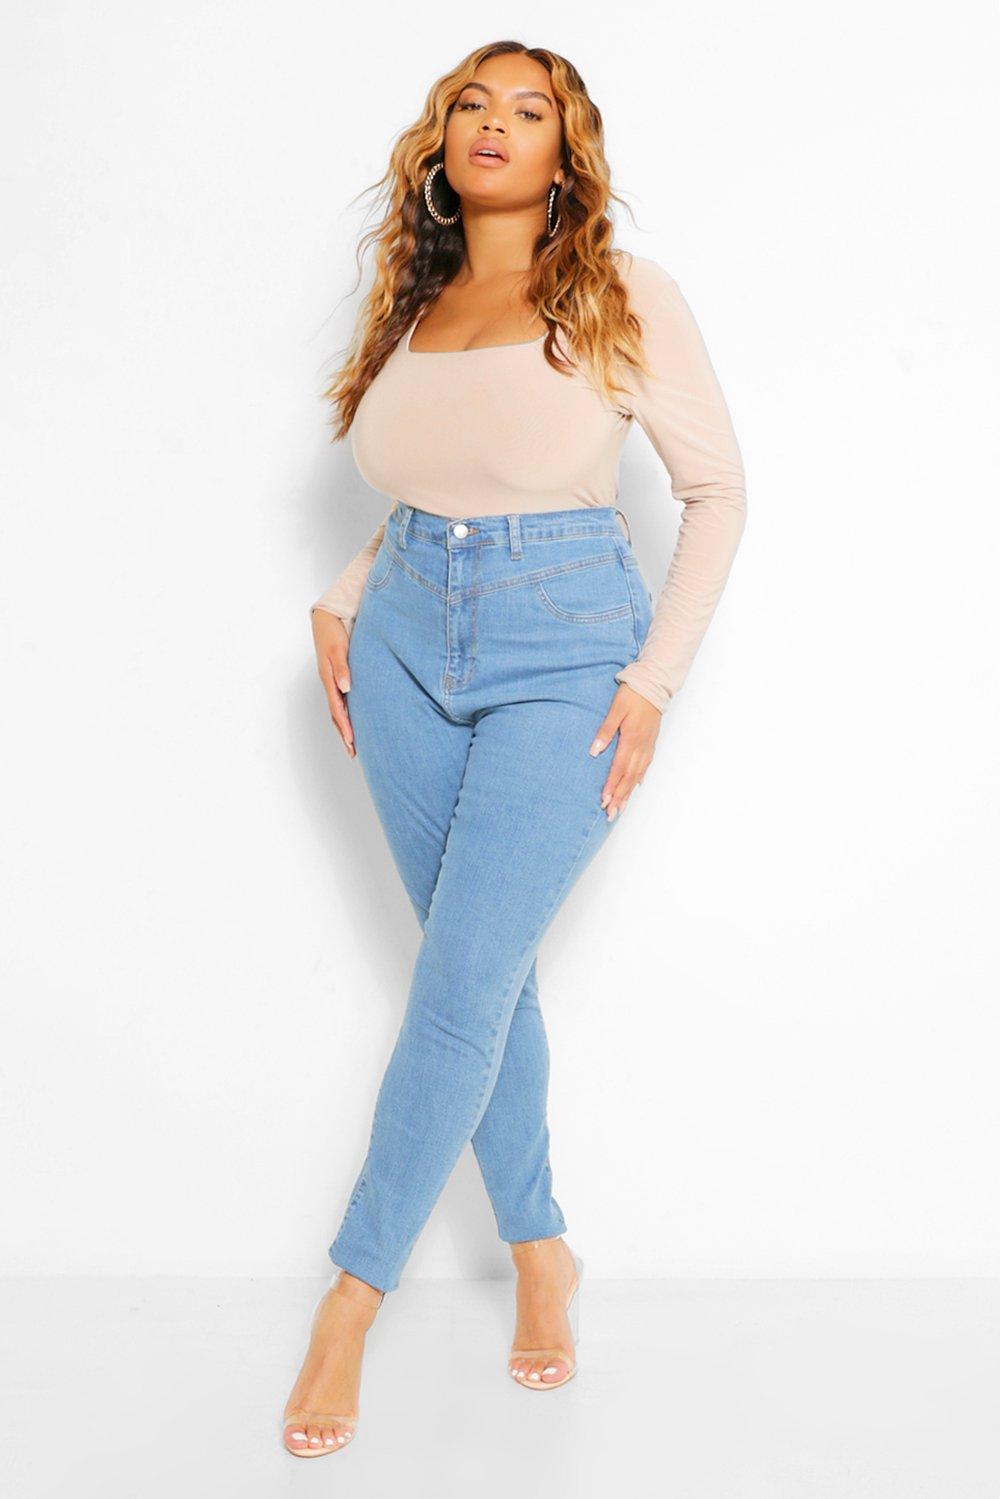 Plus Booty Seam Shaper Skinny Jean 17